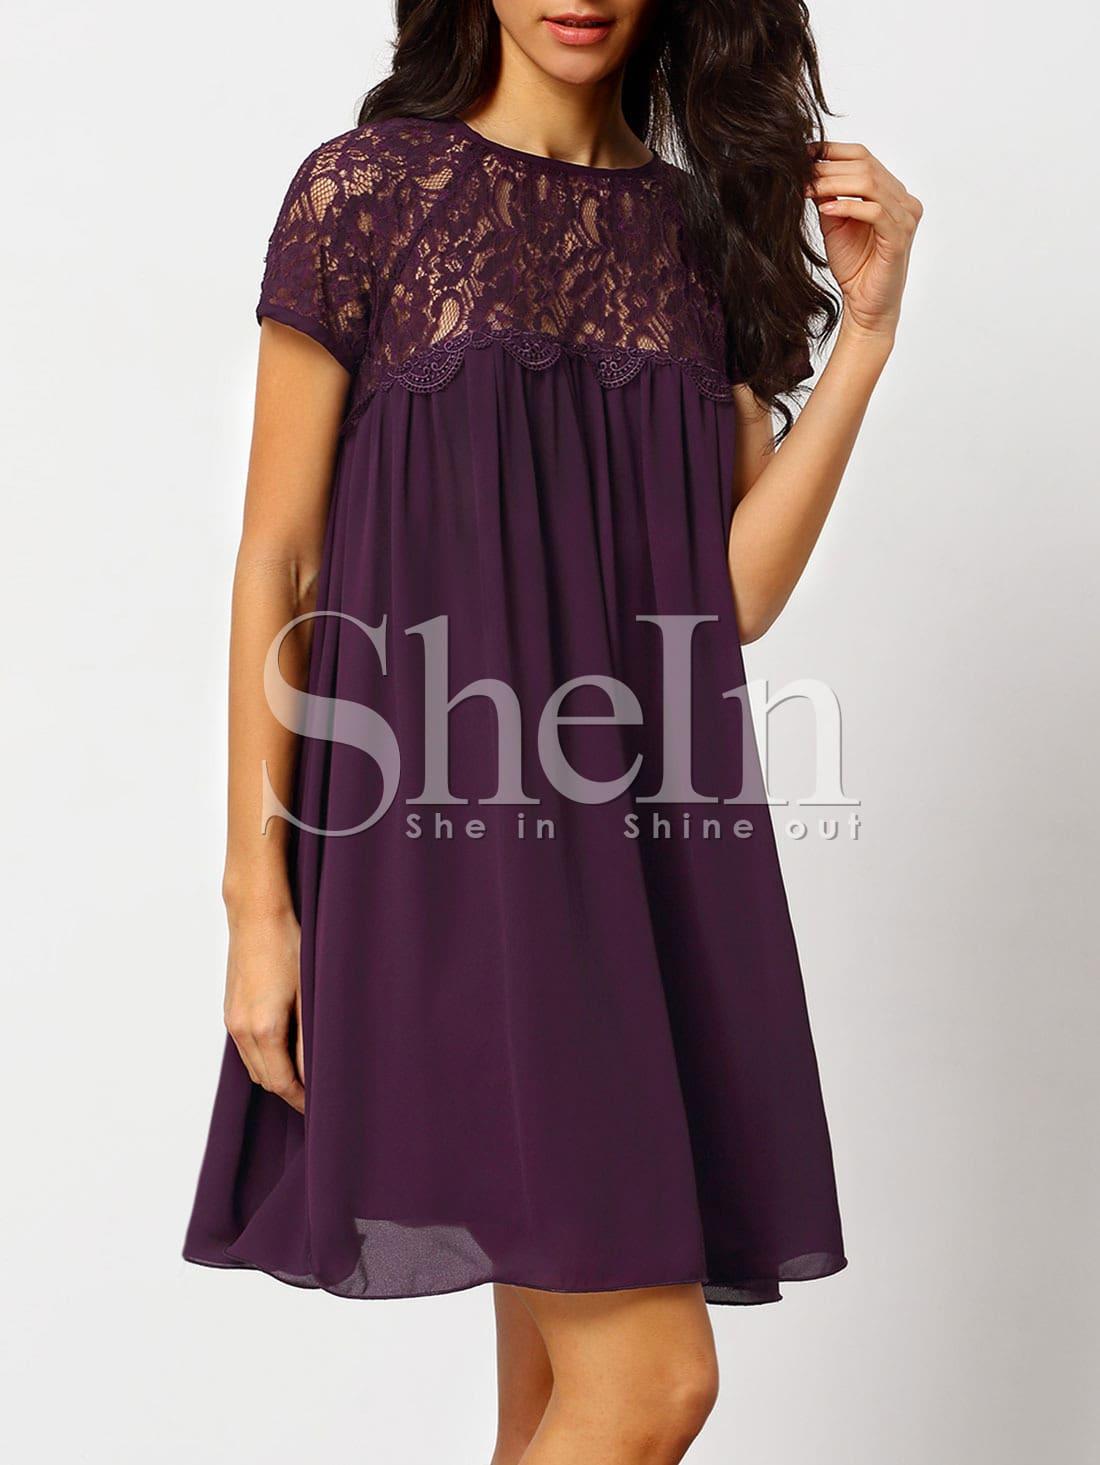 8289f3d7867 Purple Crew Neck With Lace Shift Dress